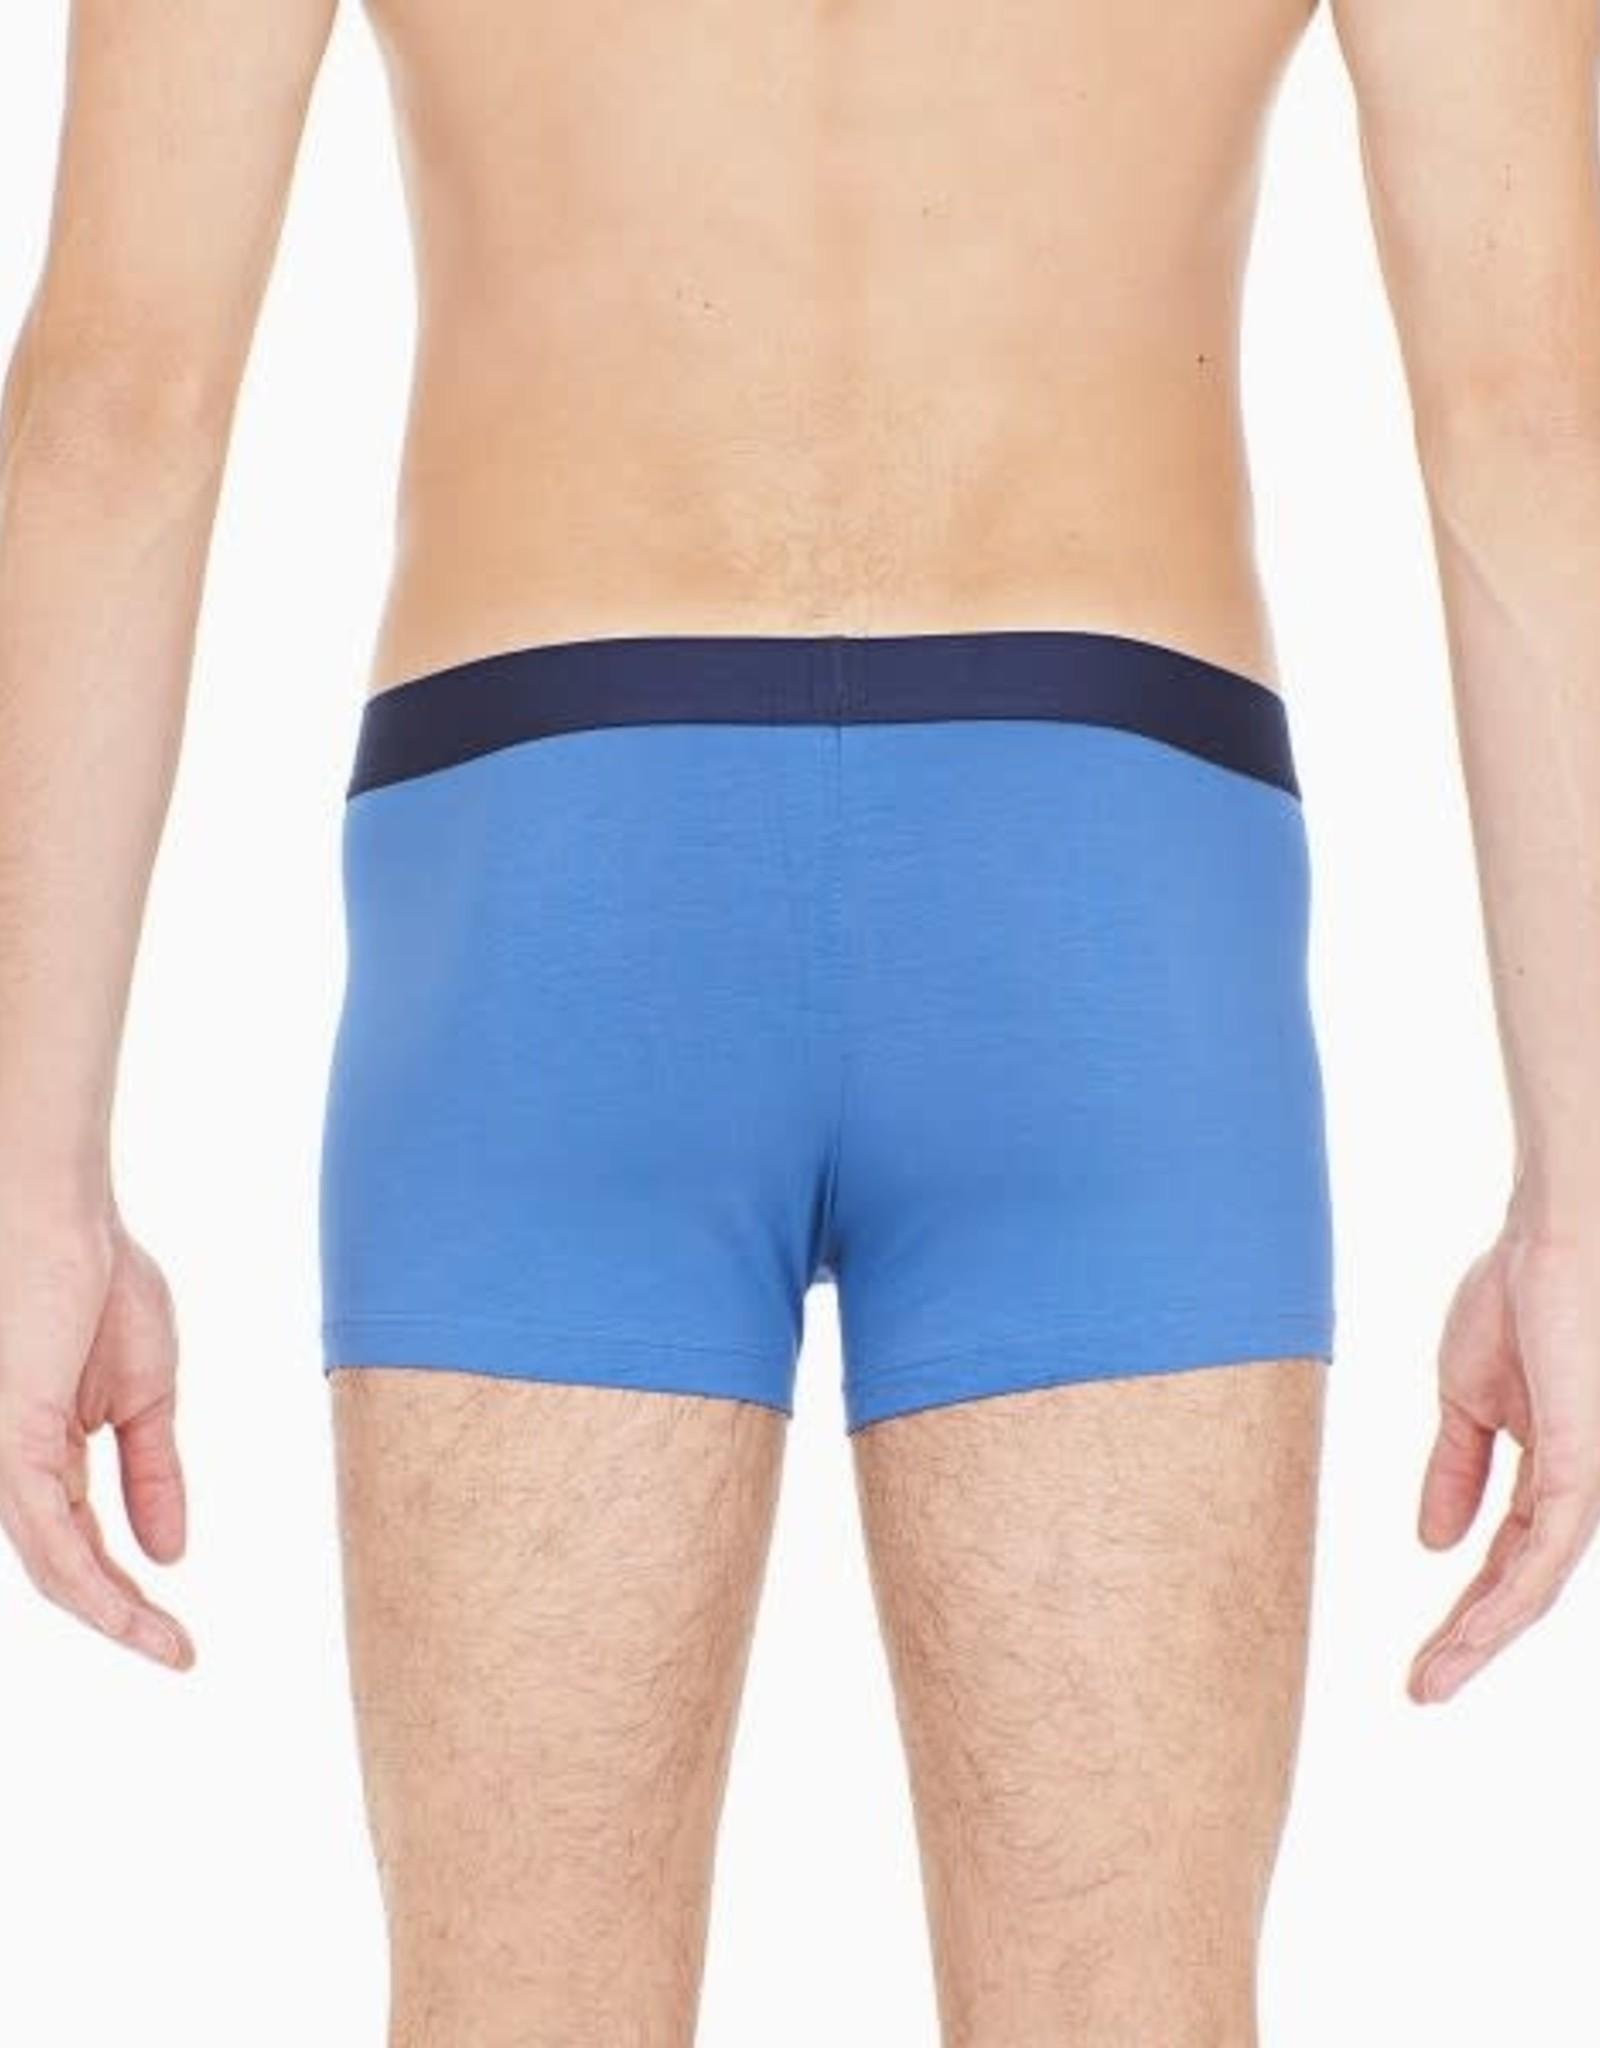 HOM Boxer Briefs 2P - Colorful 2, navt-blue